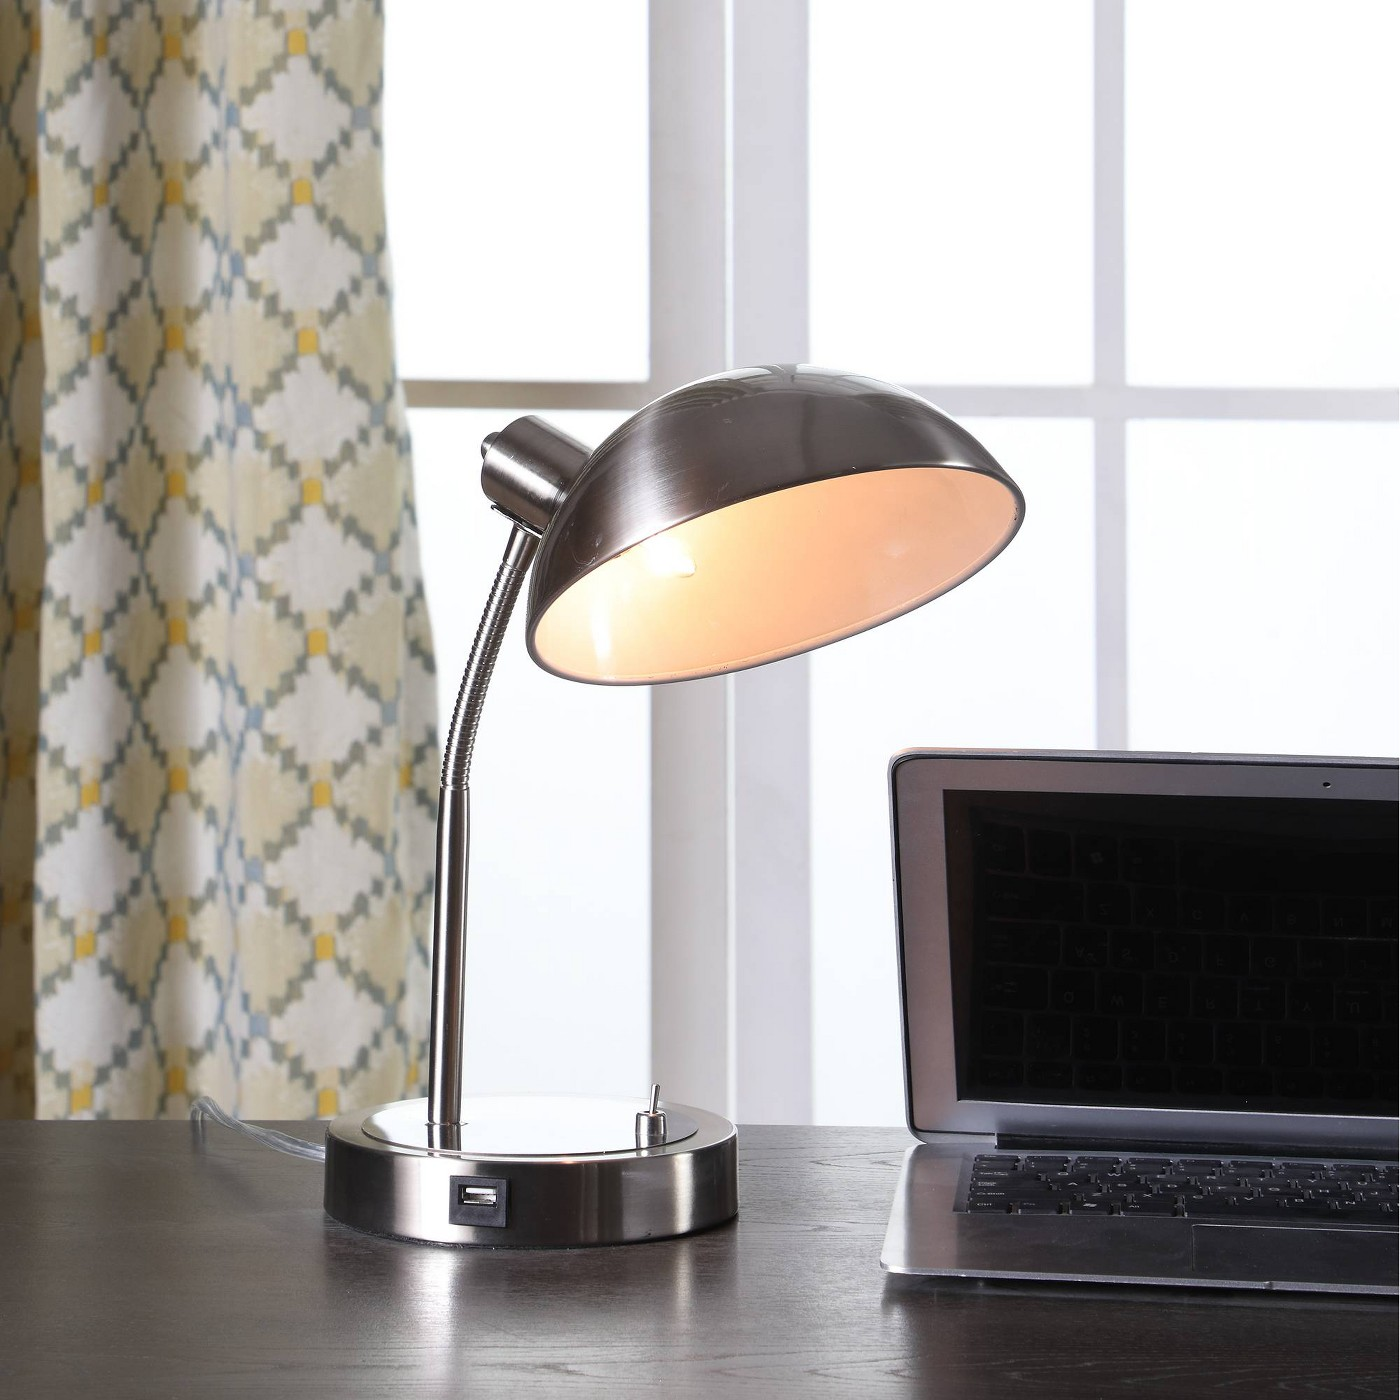 Leone Flexible Neck Desk Lamp Silver (Lamp Only) - Ore International